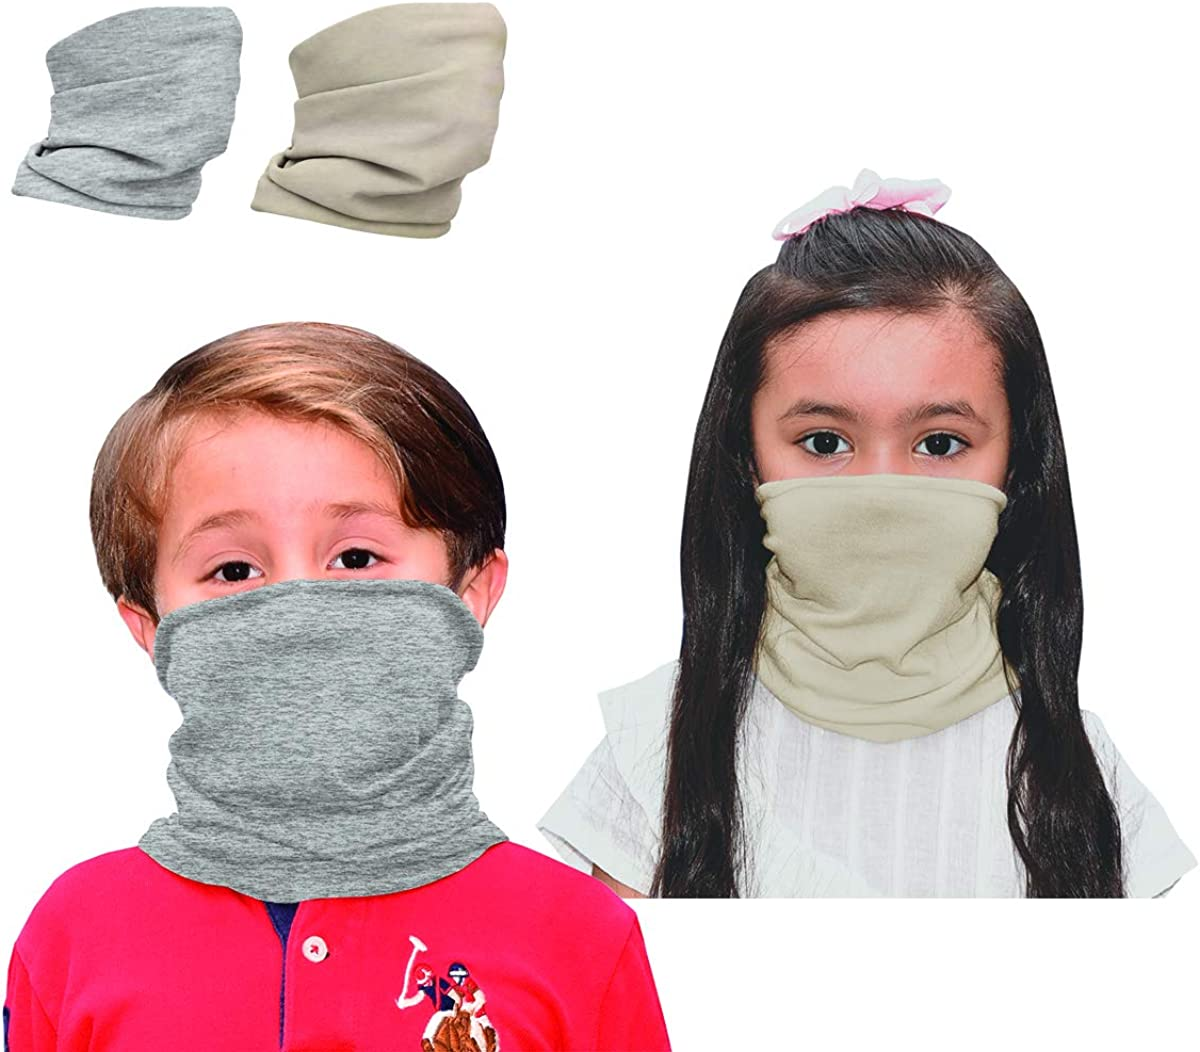 2 pcs Kids Neck Gaiter Face Mask Bandana Scarf Adjustable Reusable Solid Colors Multifunctional Comfortable Sports